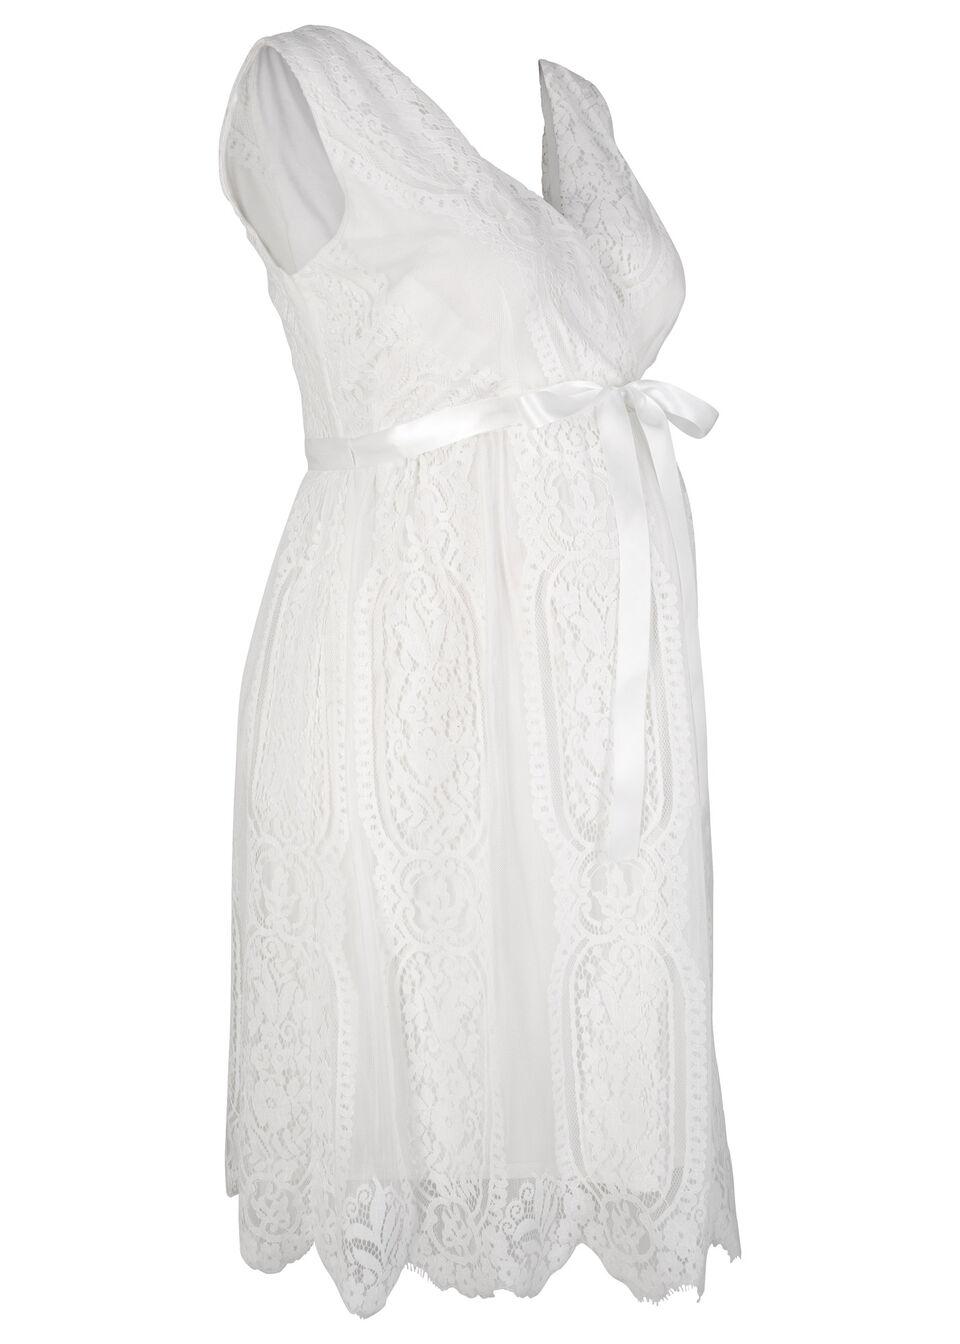 77fbcacbf Bonprix Tehotenské svadobné šaty - Glami.sk